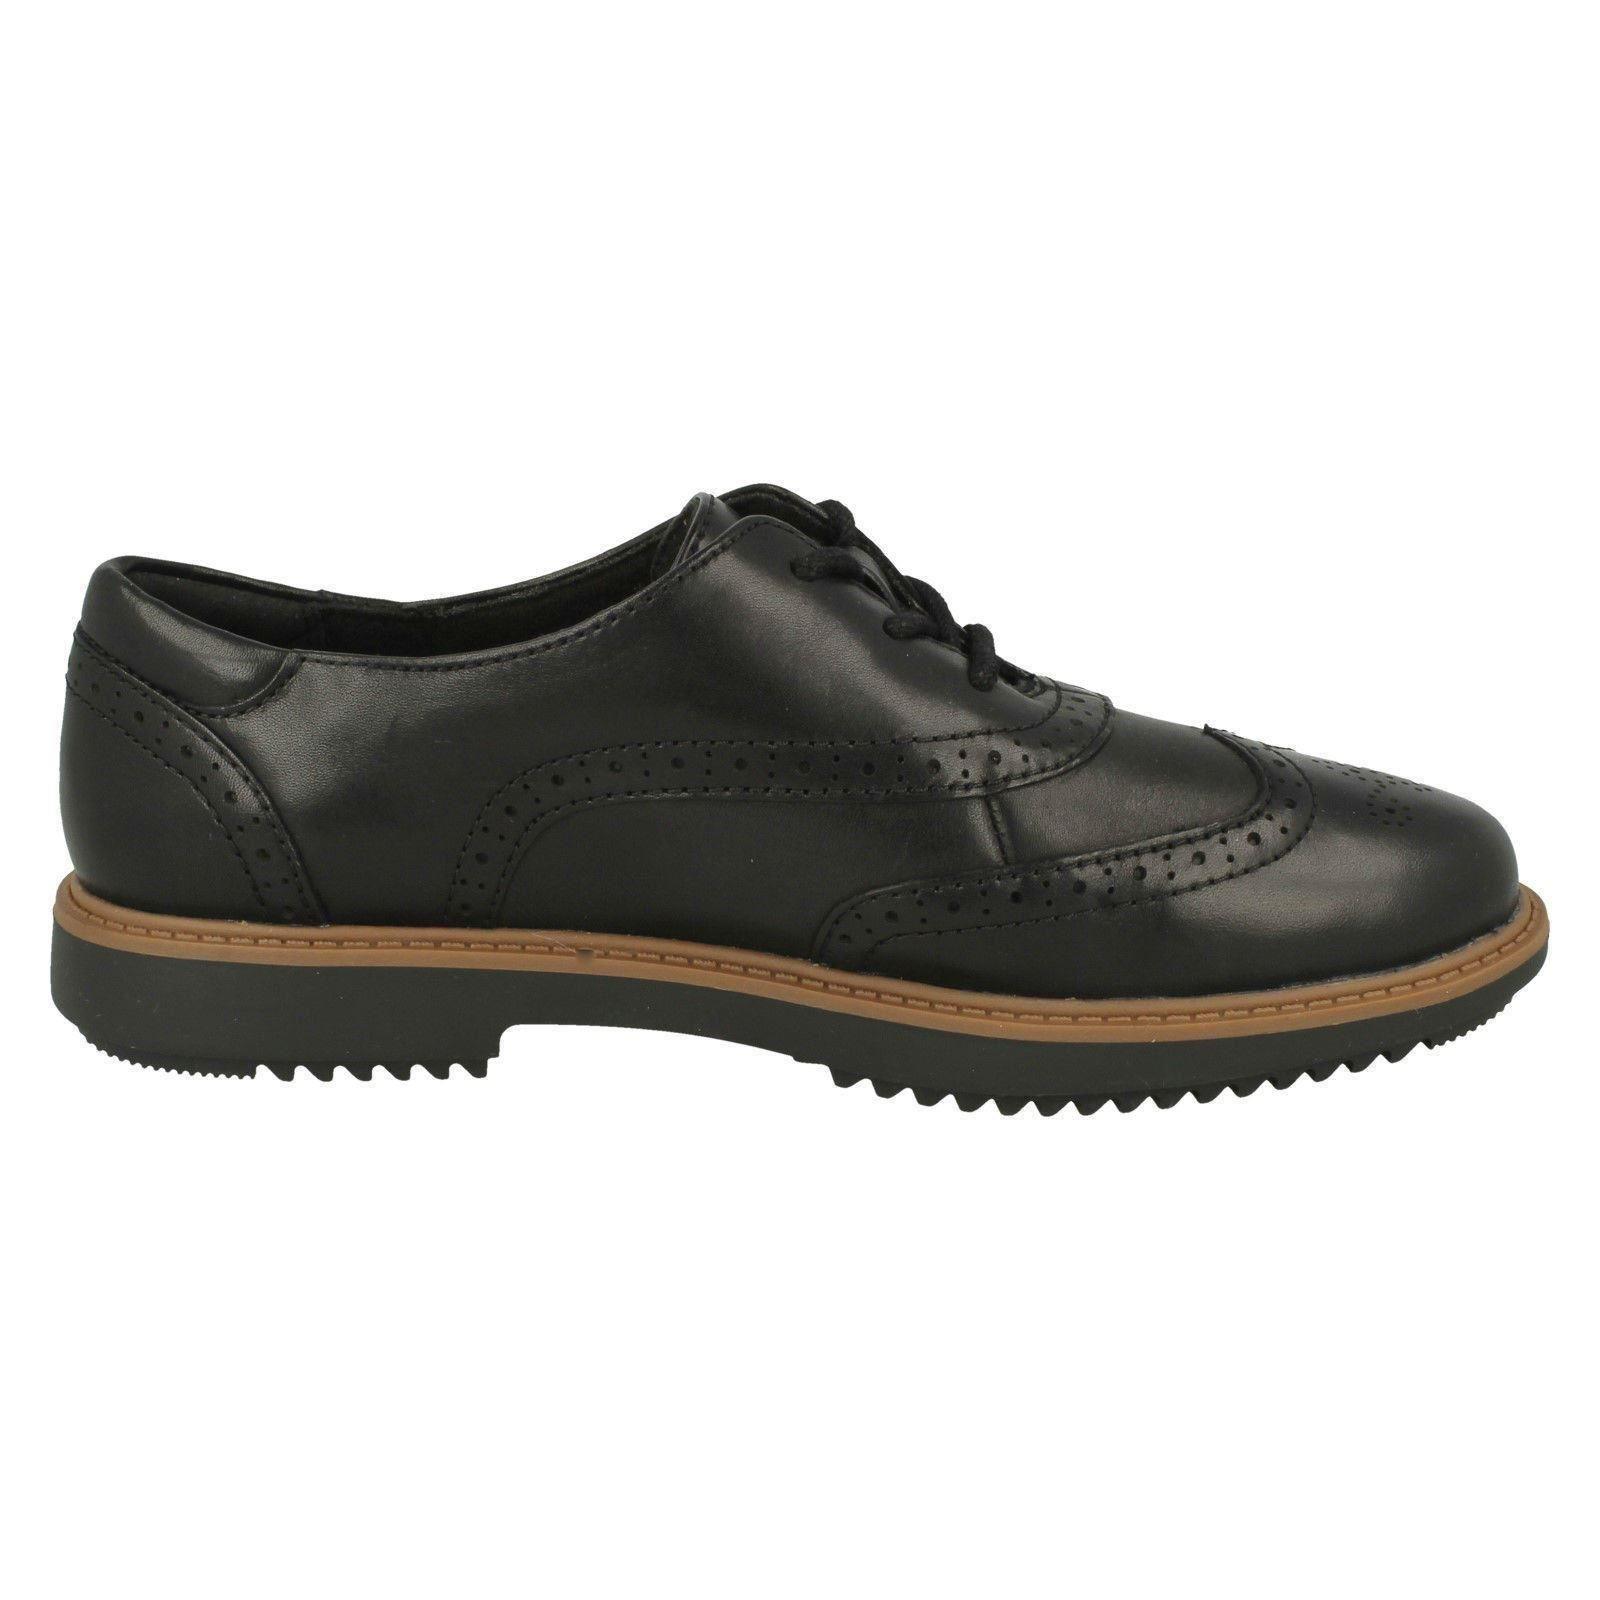 Womens Clarks Lace Up Brogue Style shoes shoes shoes - Raisie Hilde 1712a6